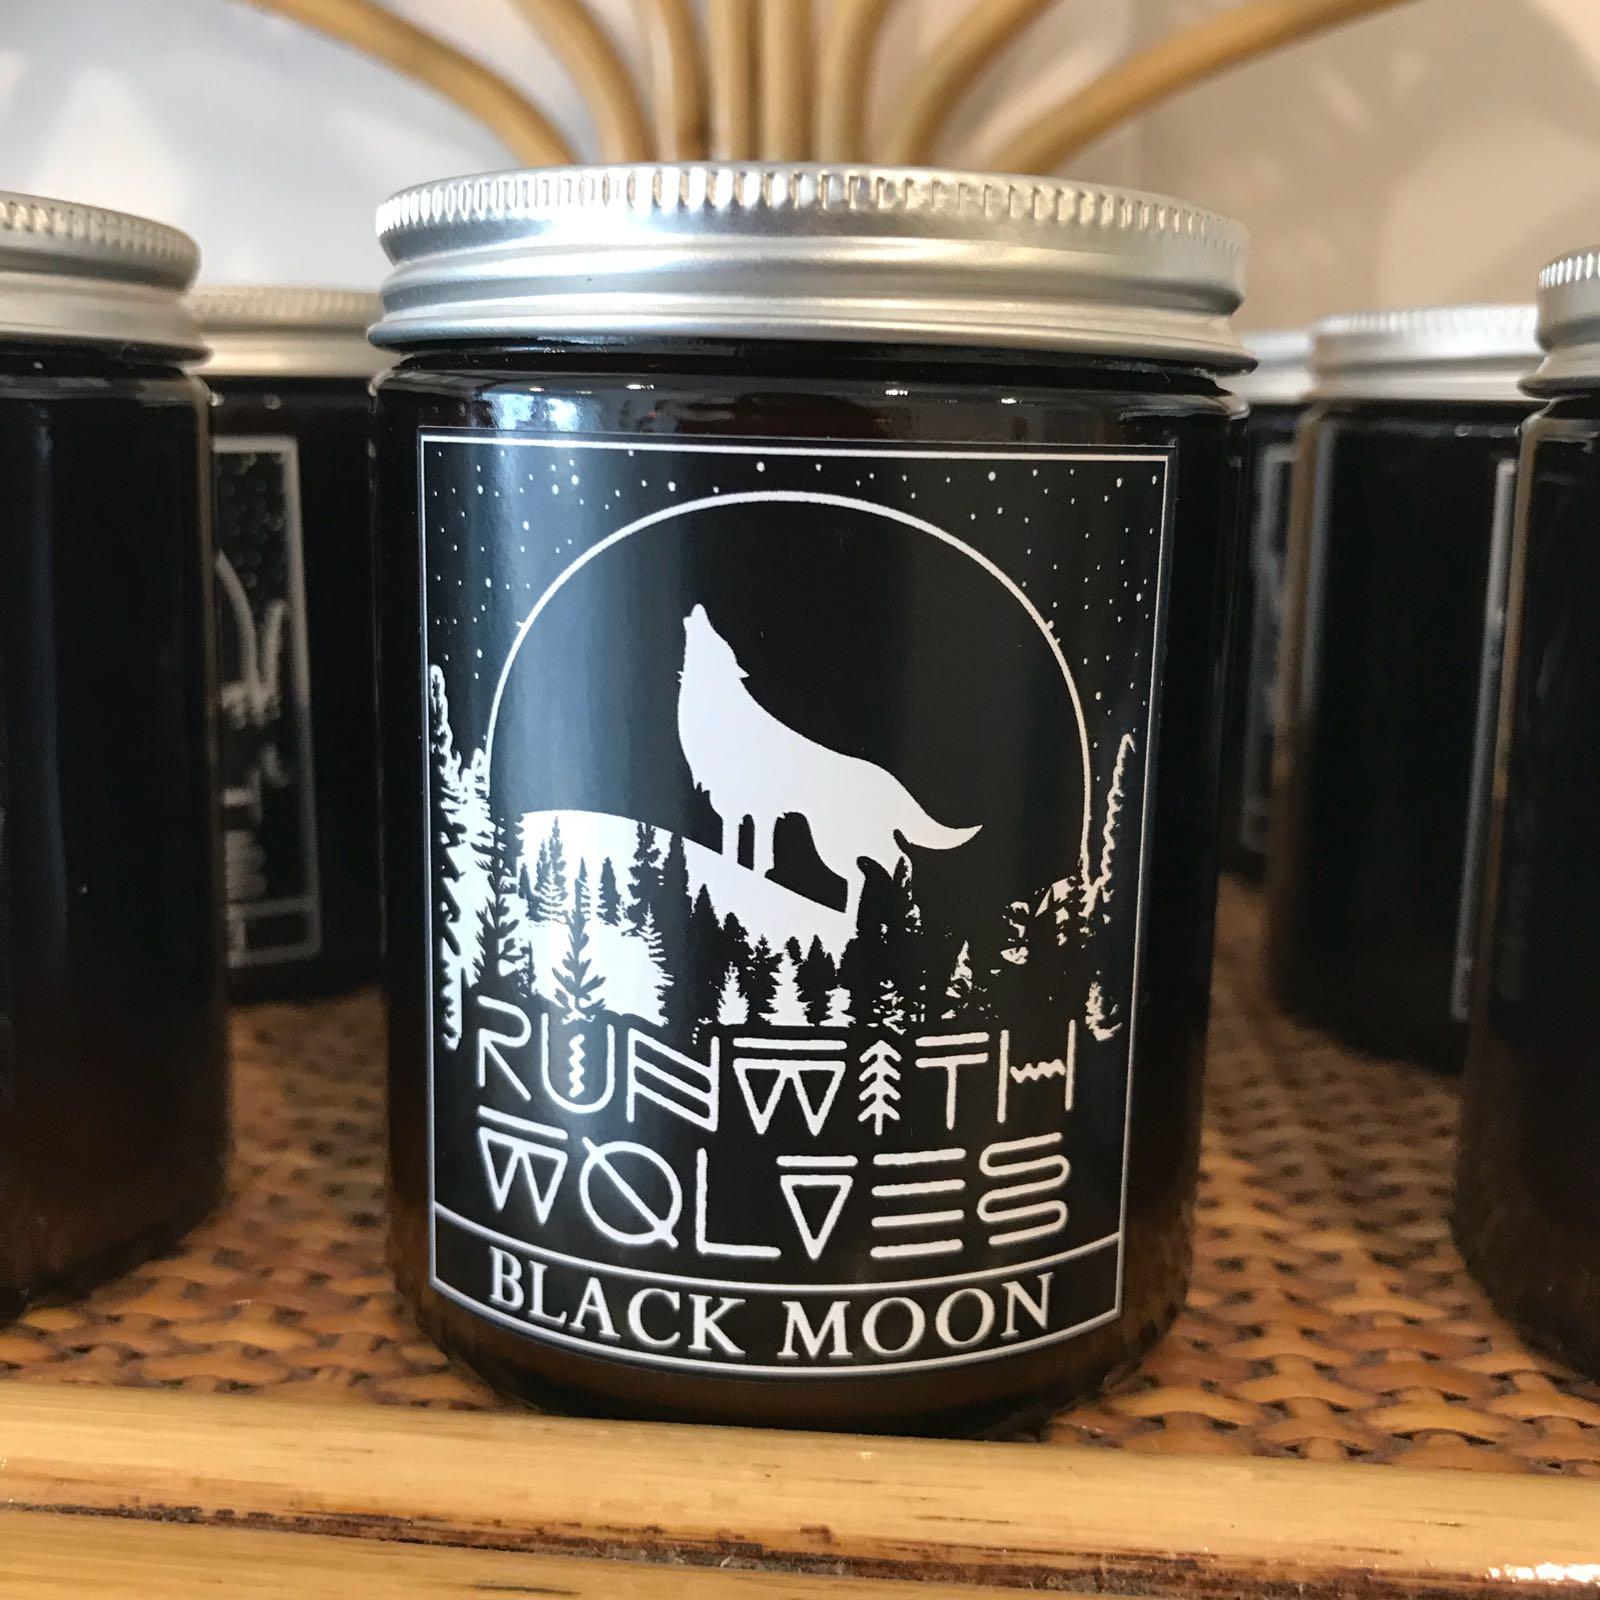 Black Moon Soy Wax Candle